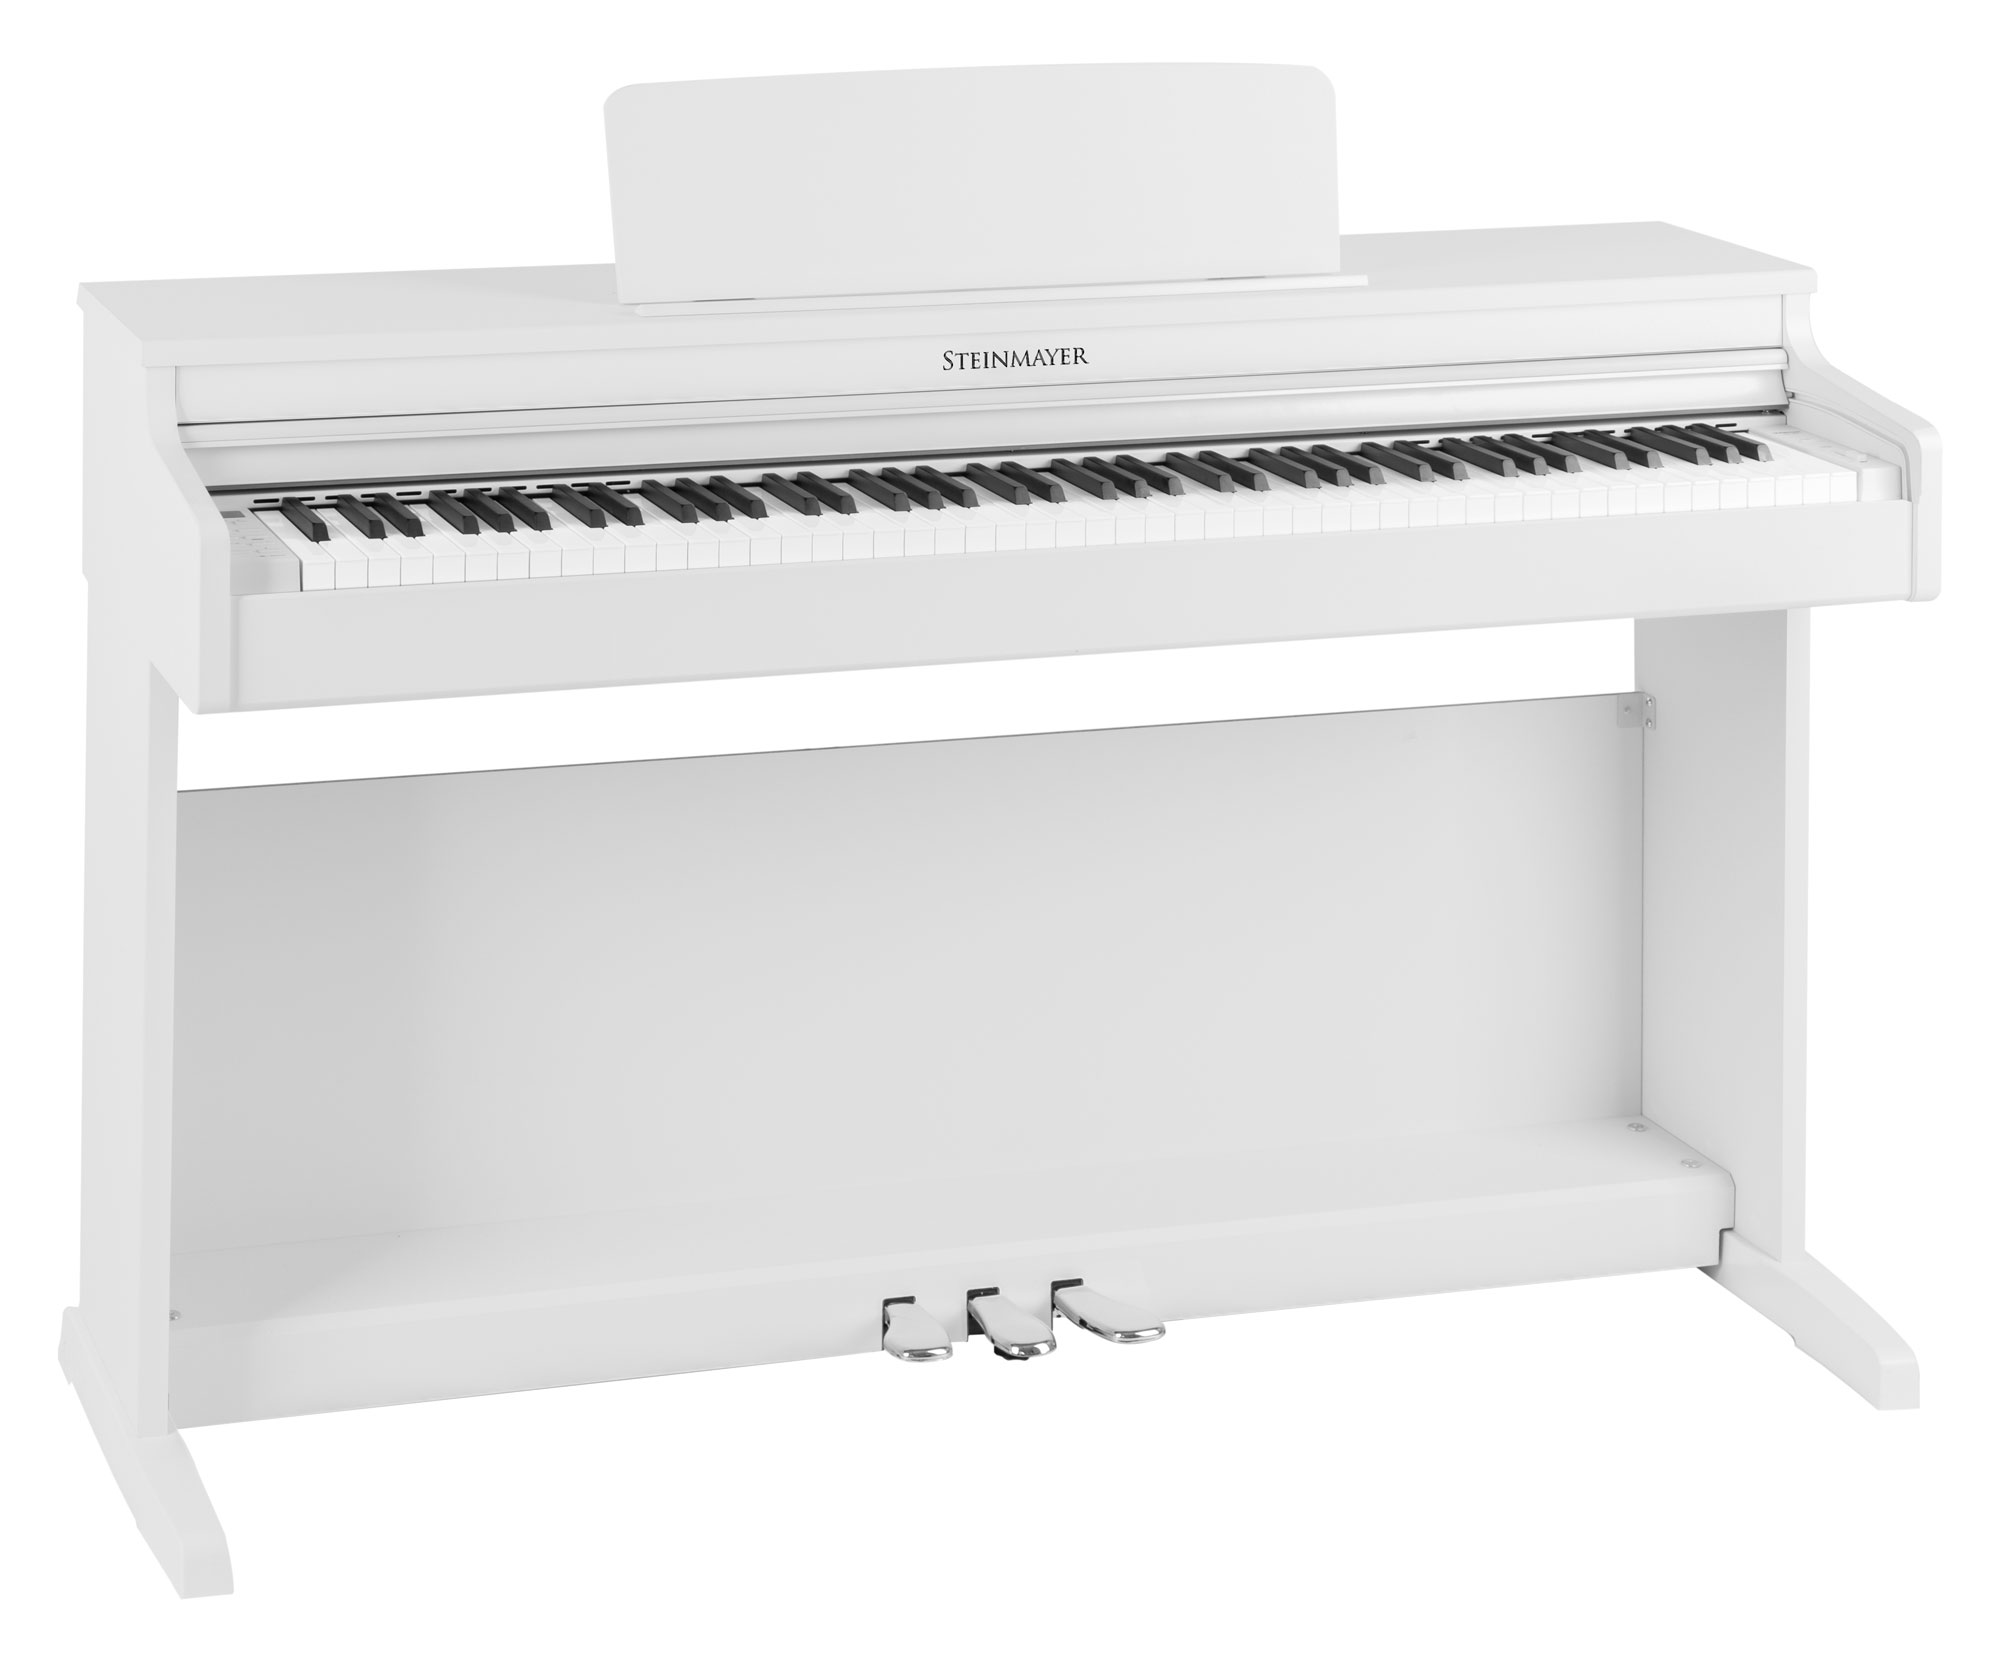 Digitalpianos - Steinmayer DP 321 WM Digitalpiano weiß matt - Onlineshop Musikhaus Kirstein